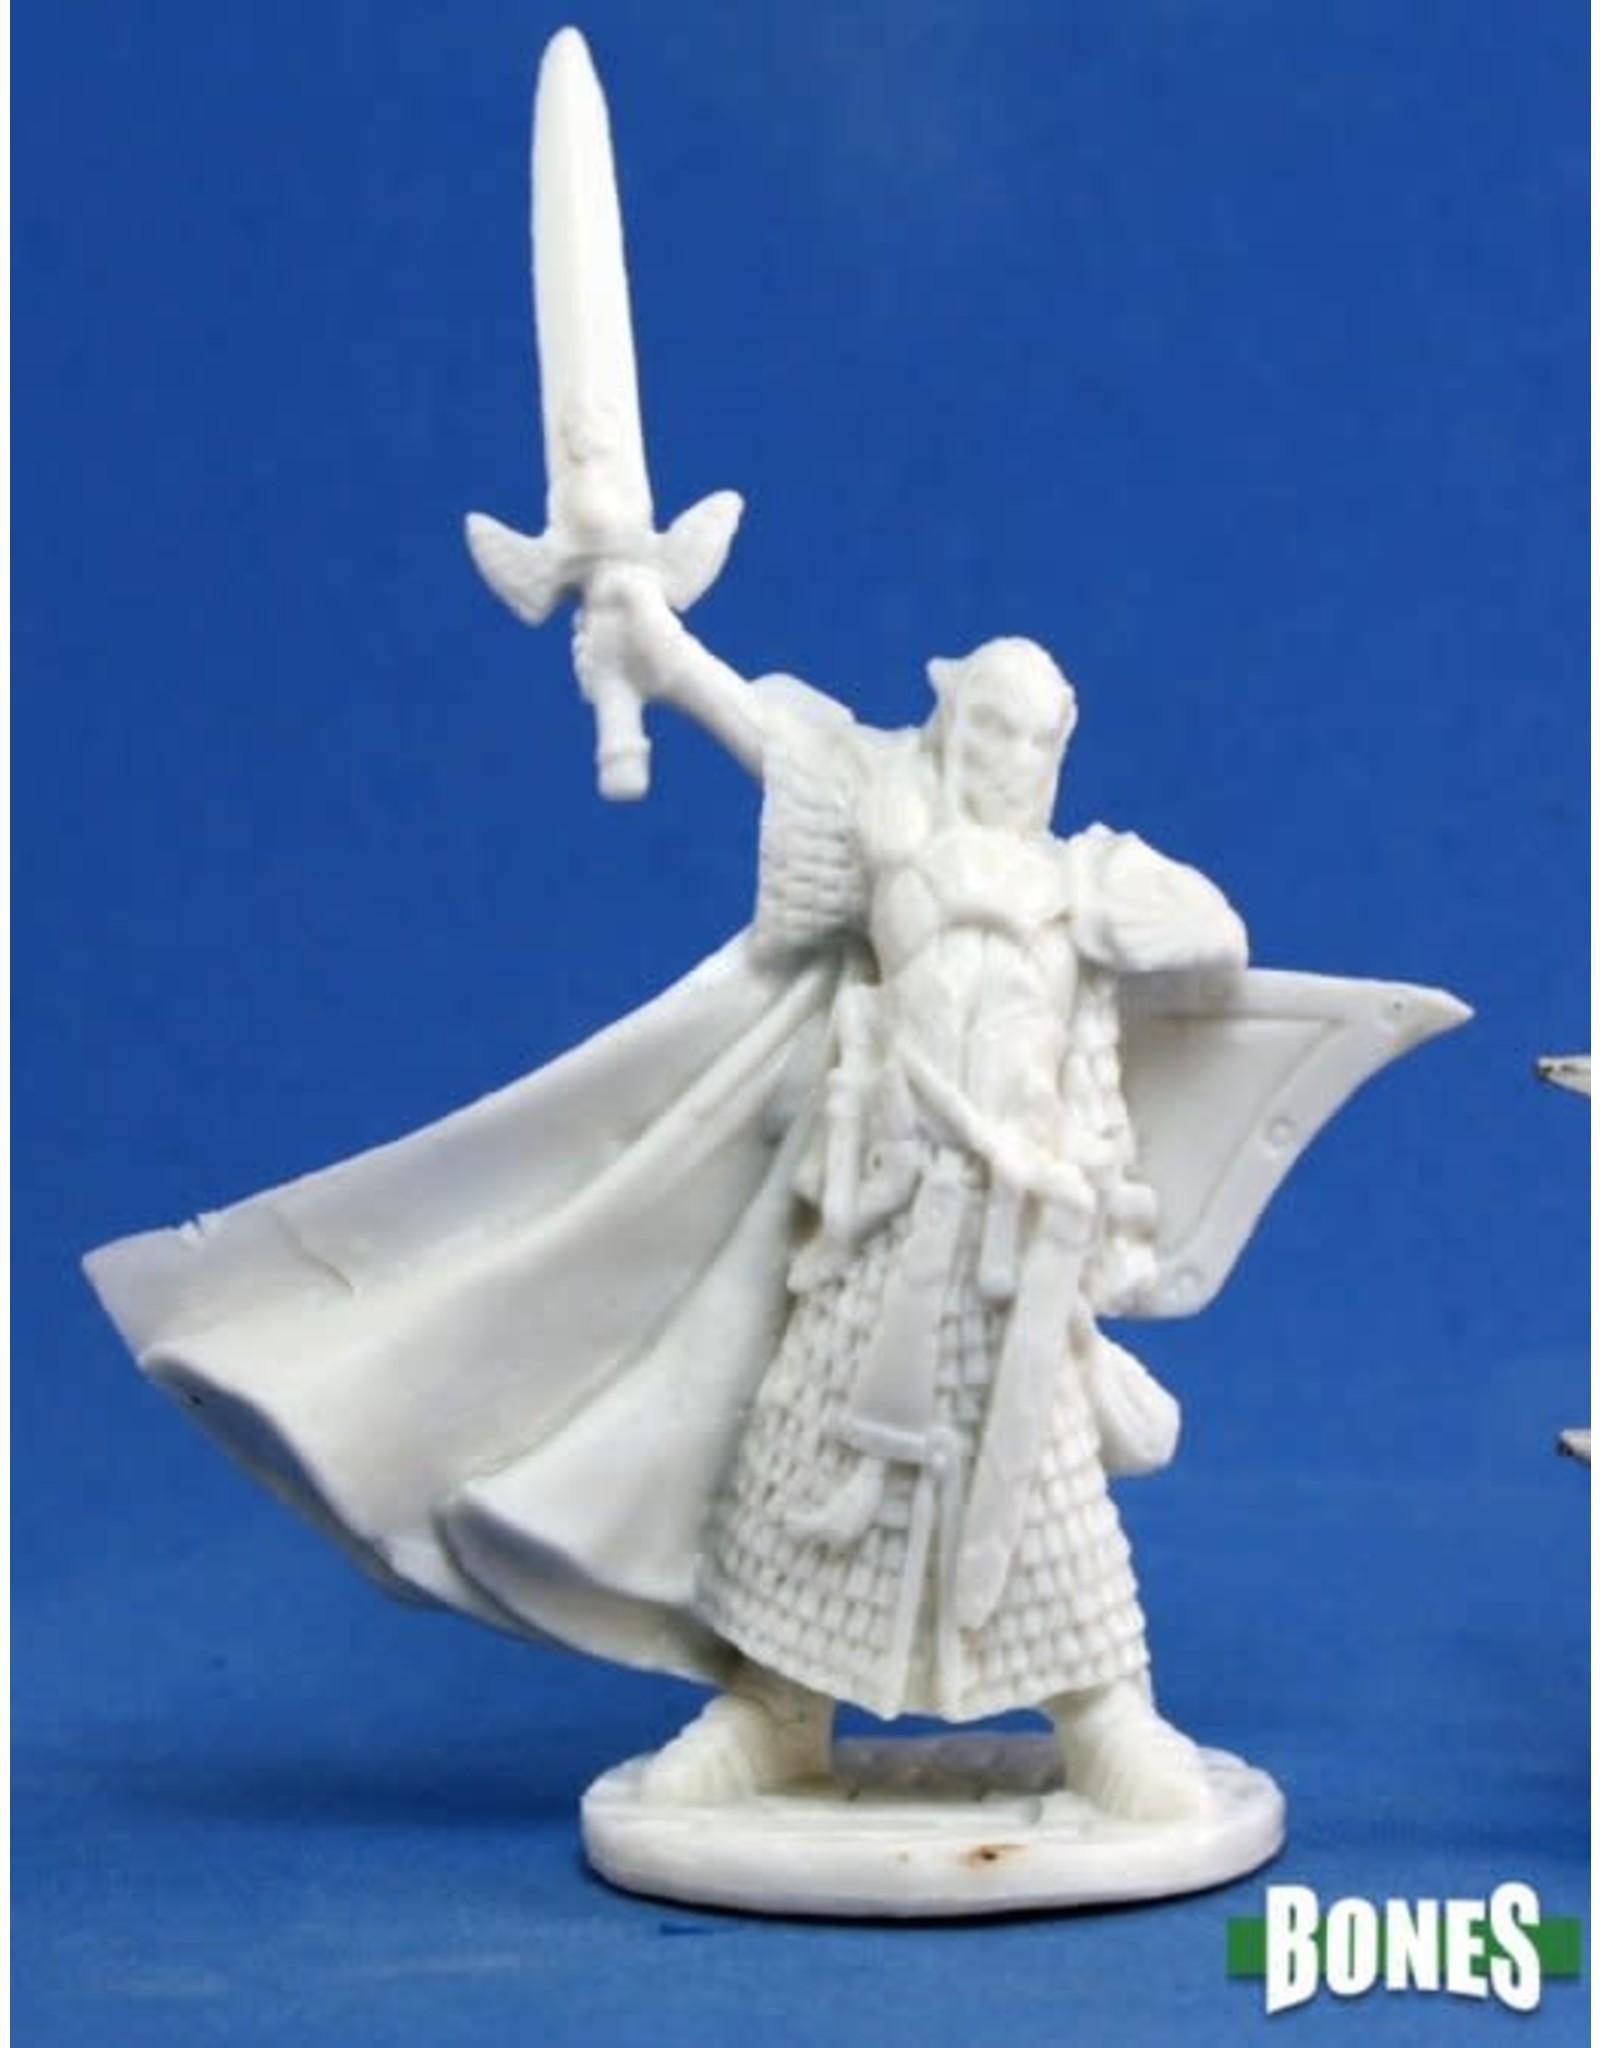 Reaper Miniatures Bones: Turanil, Male Elf Paladin